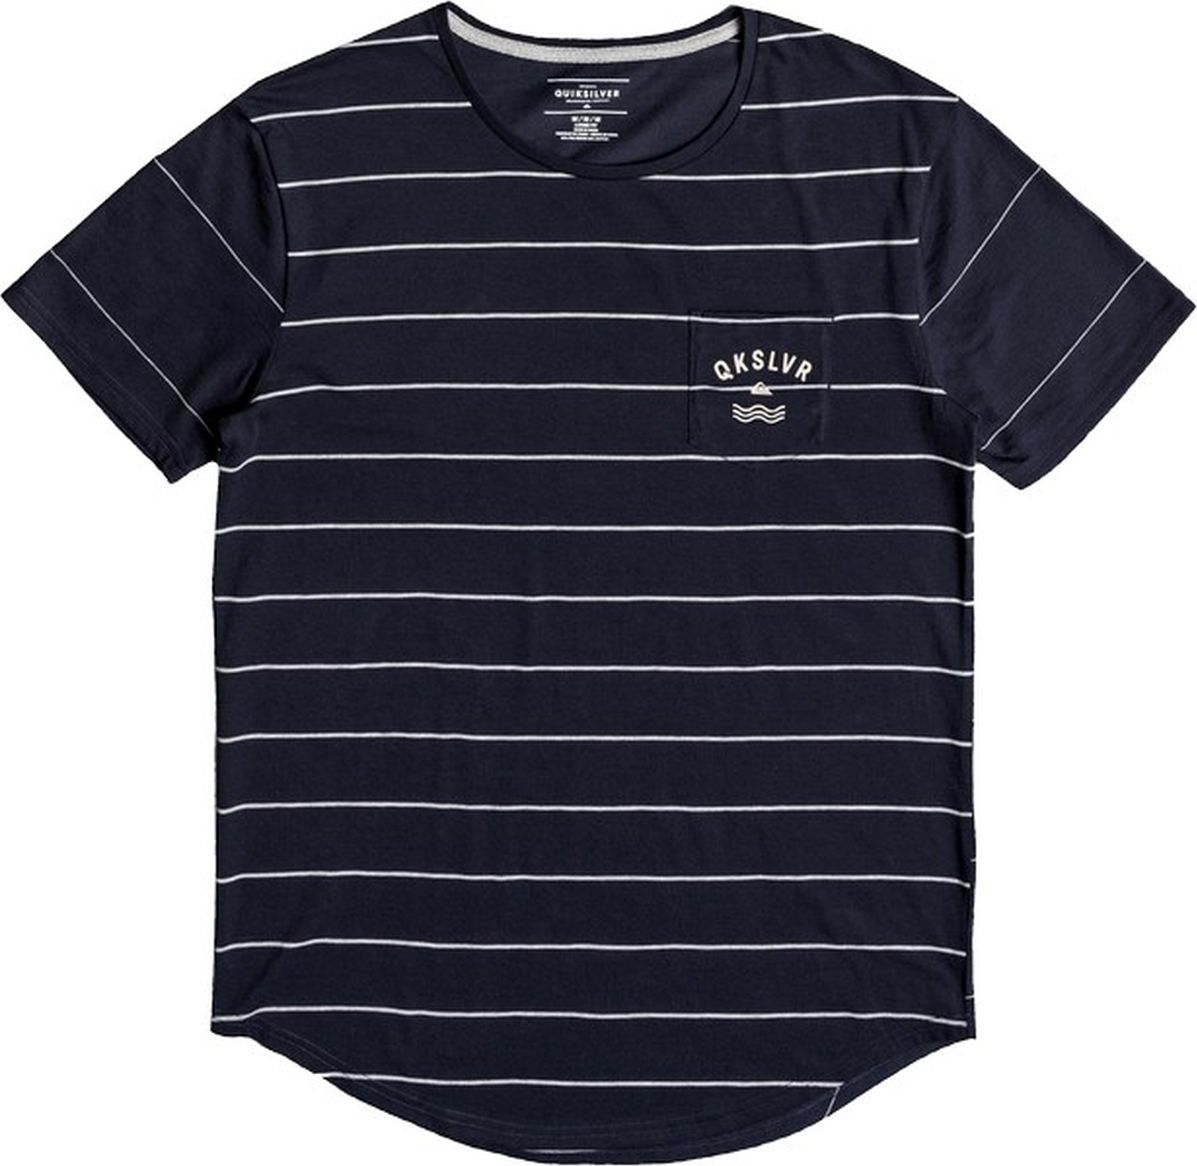 Футболка мужская Quiksilver, цвет: синий. EQYKT03682-BYJ3. Размер XXL (54) футболка мужская anta цвет синий 85835146 2 размер xxl 54